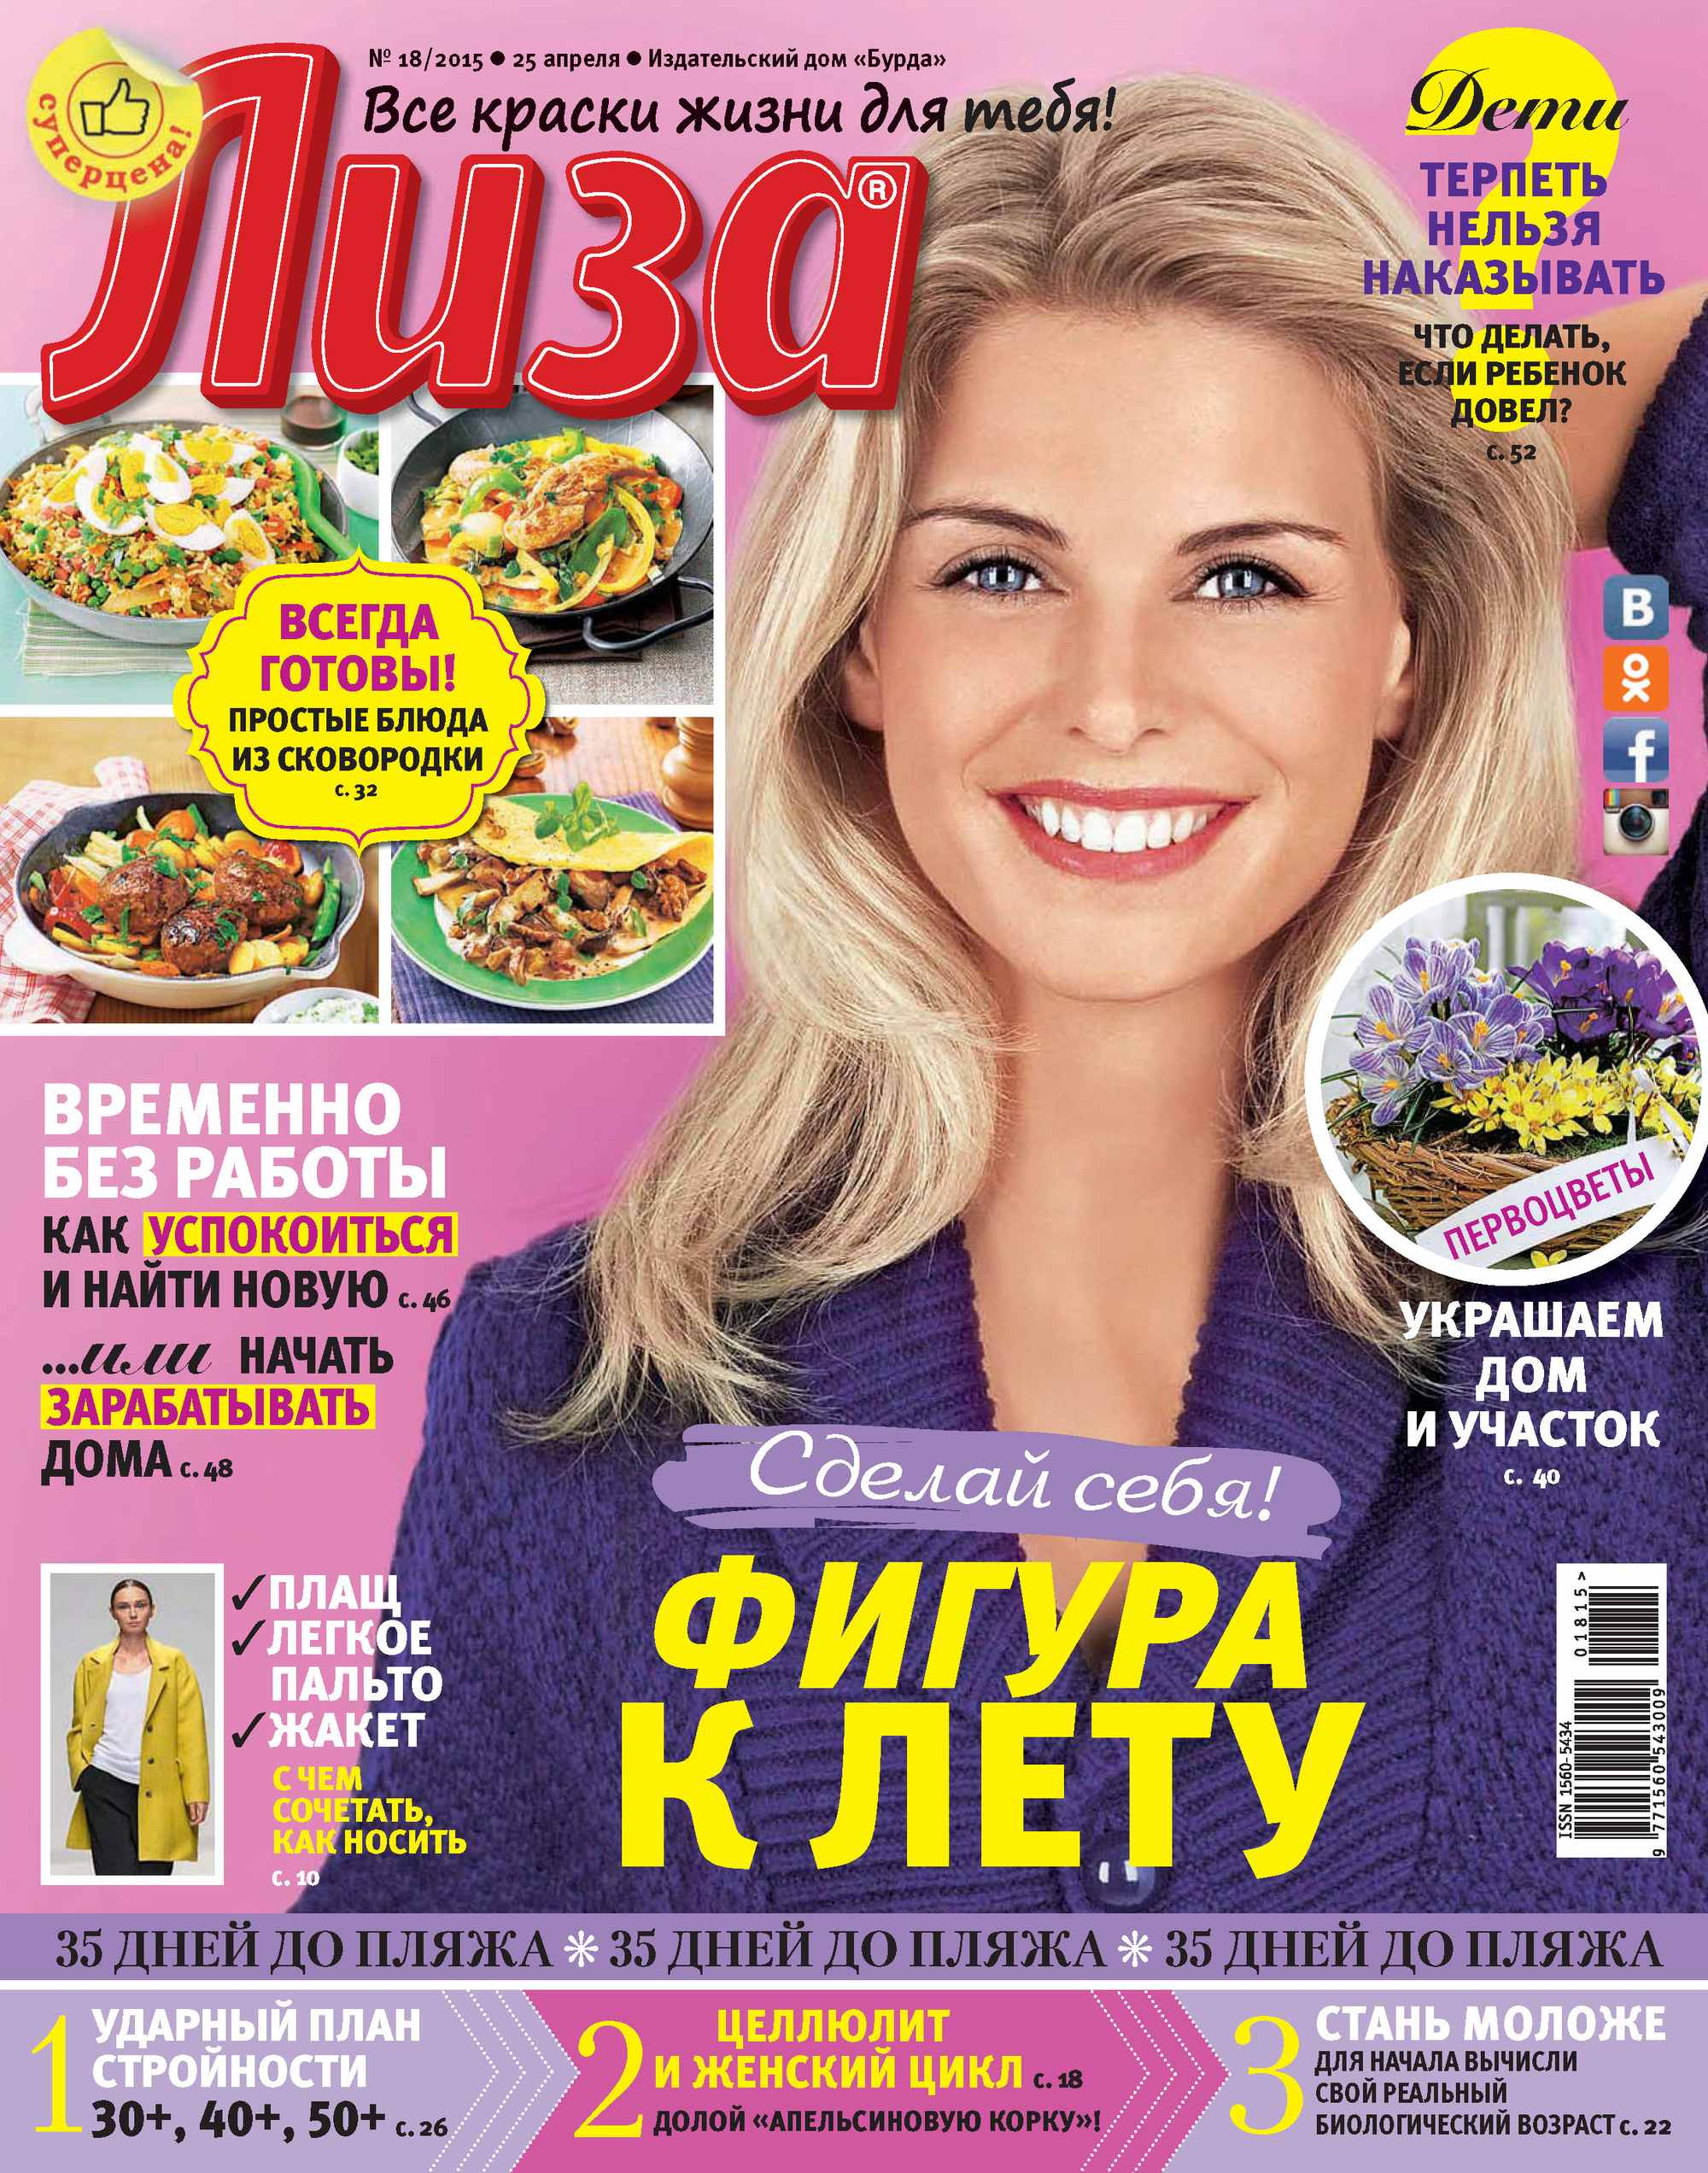 ИД «Бурда» Журнал «Лиза» №18/2015 ид бурда журнал лиза 47 2015